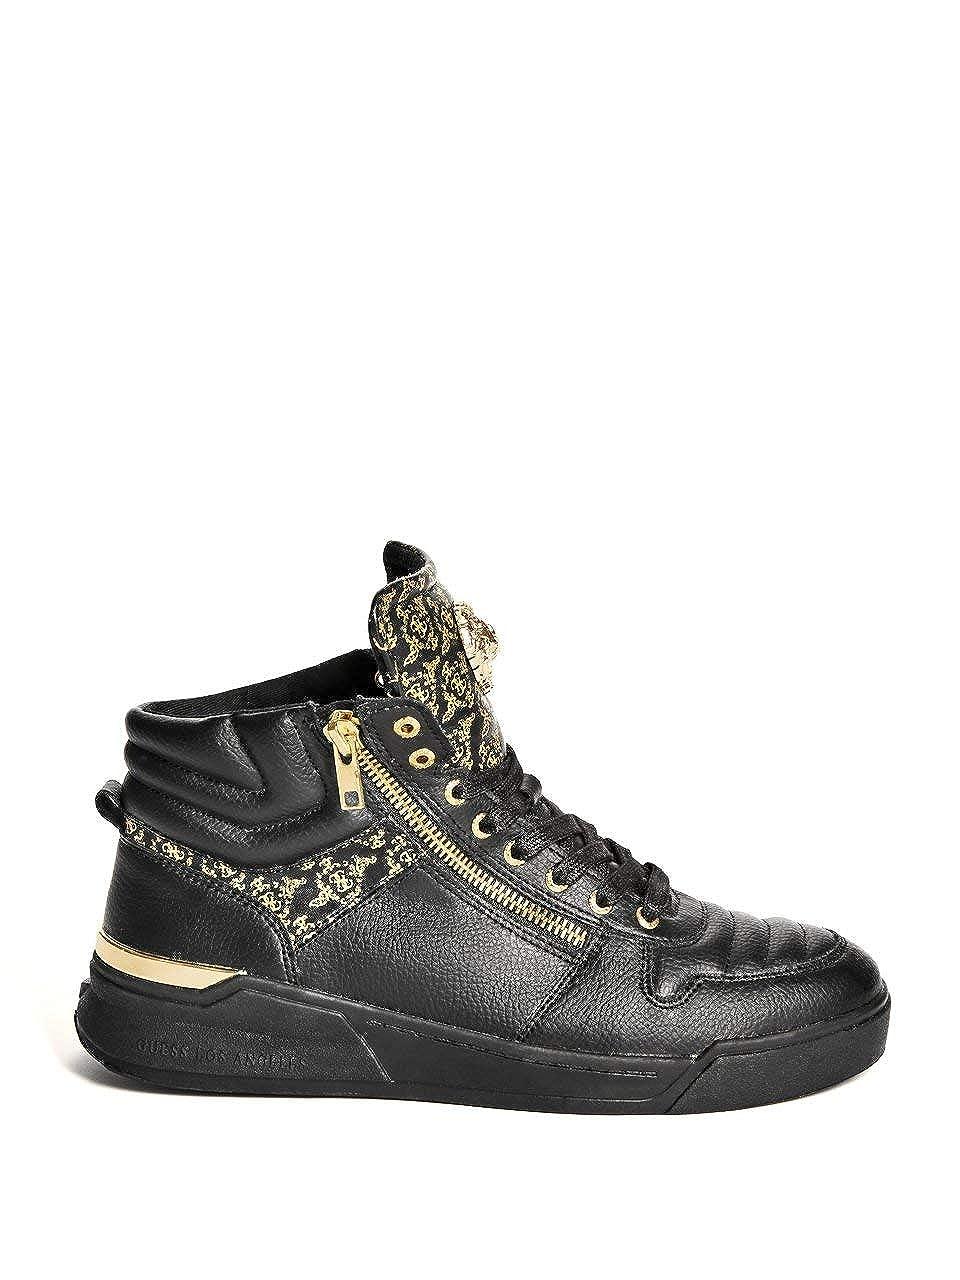 Guess Sneakers En Cuir Fm6knl Lea12 Knight Jeans pas